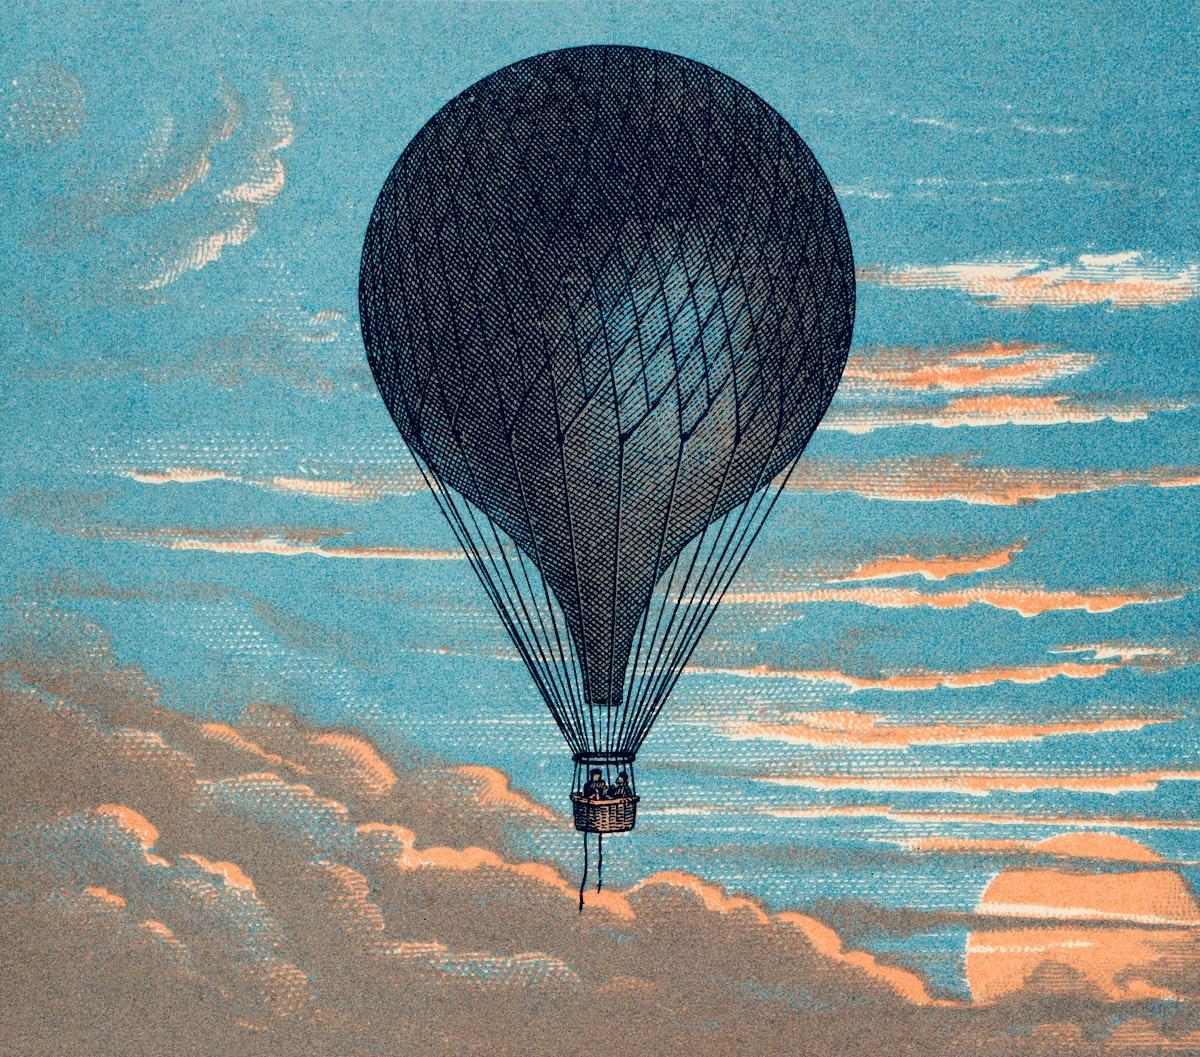 Le Ballon by Imprimeur E. Pichot. Original from Library of Congress. Digitally enhanced by rawpixel.